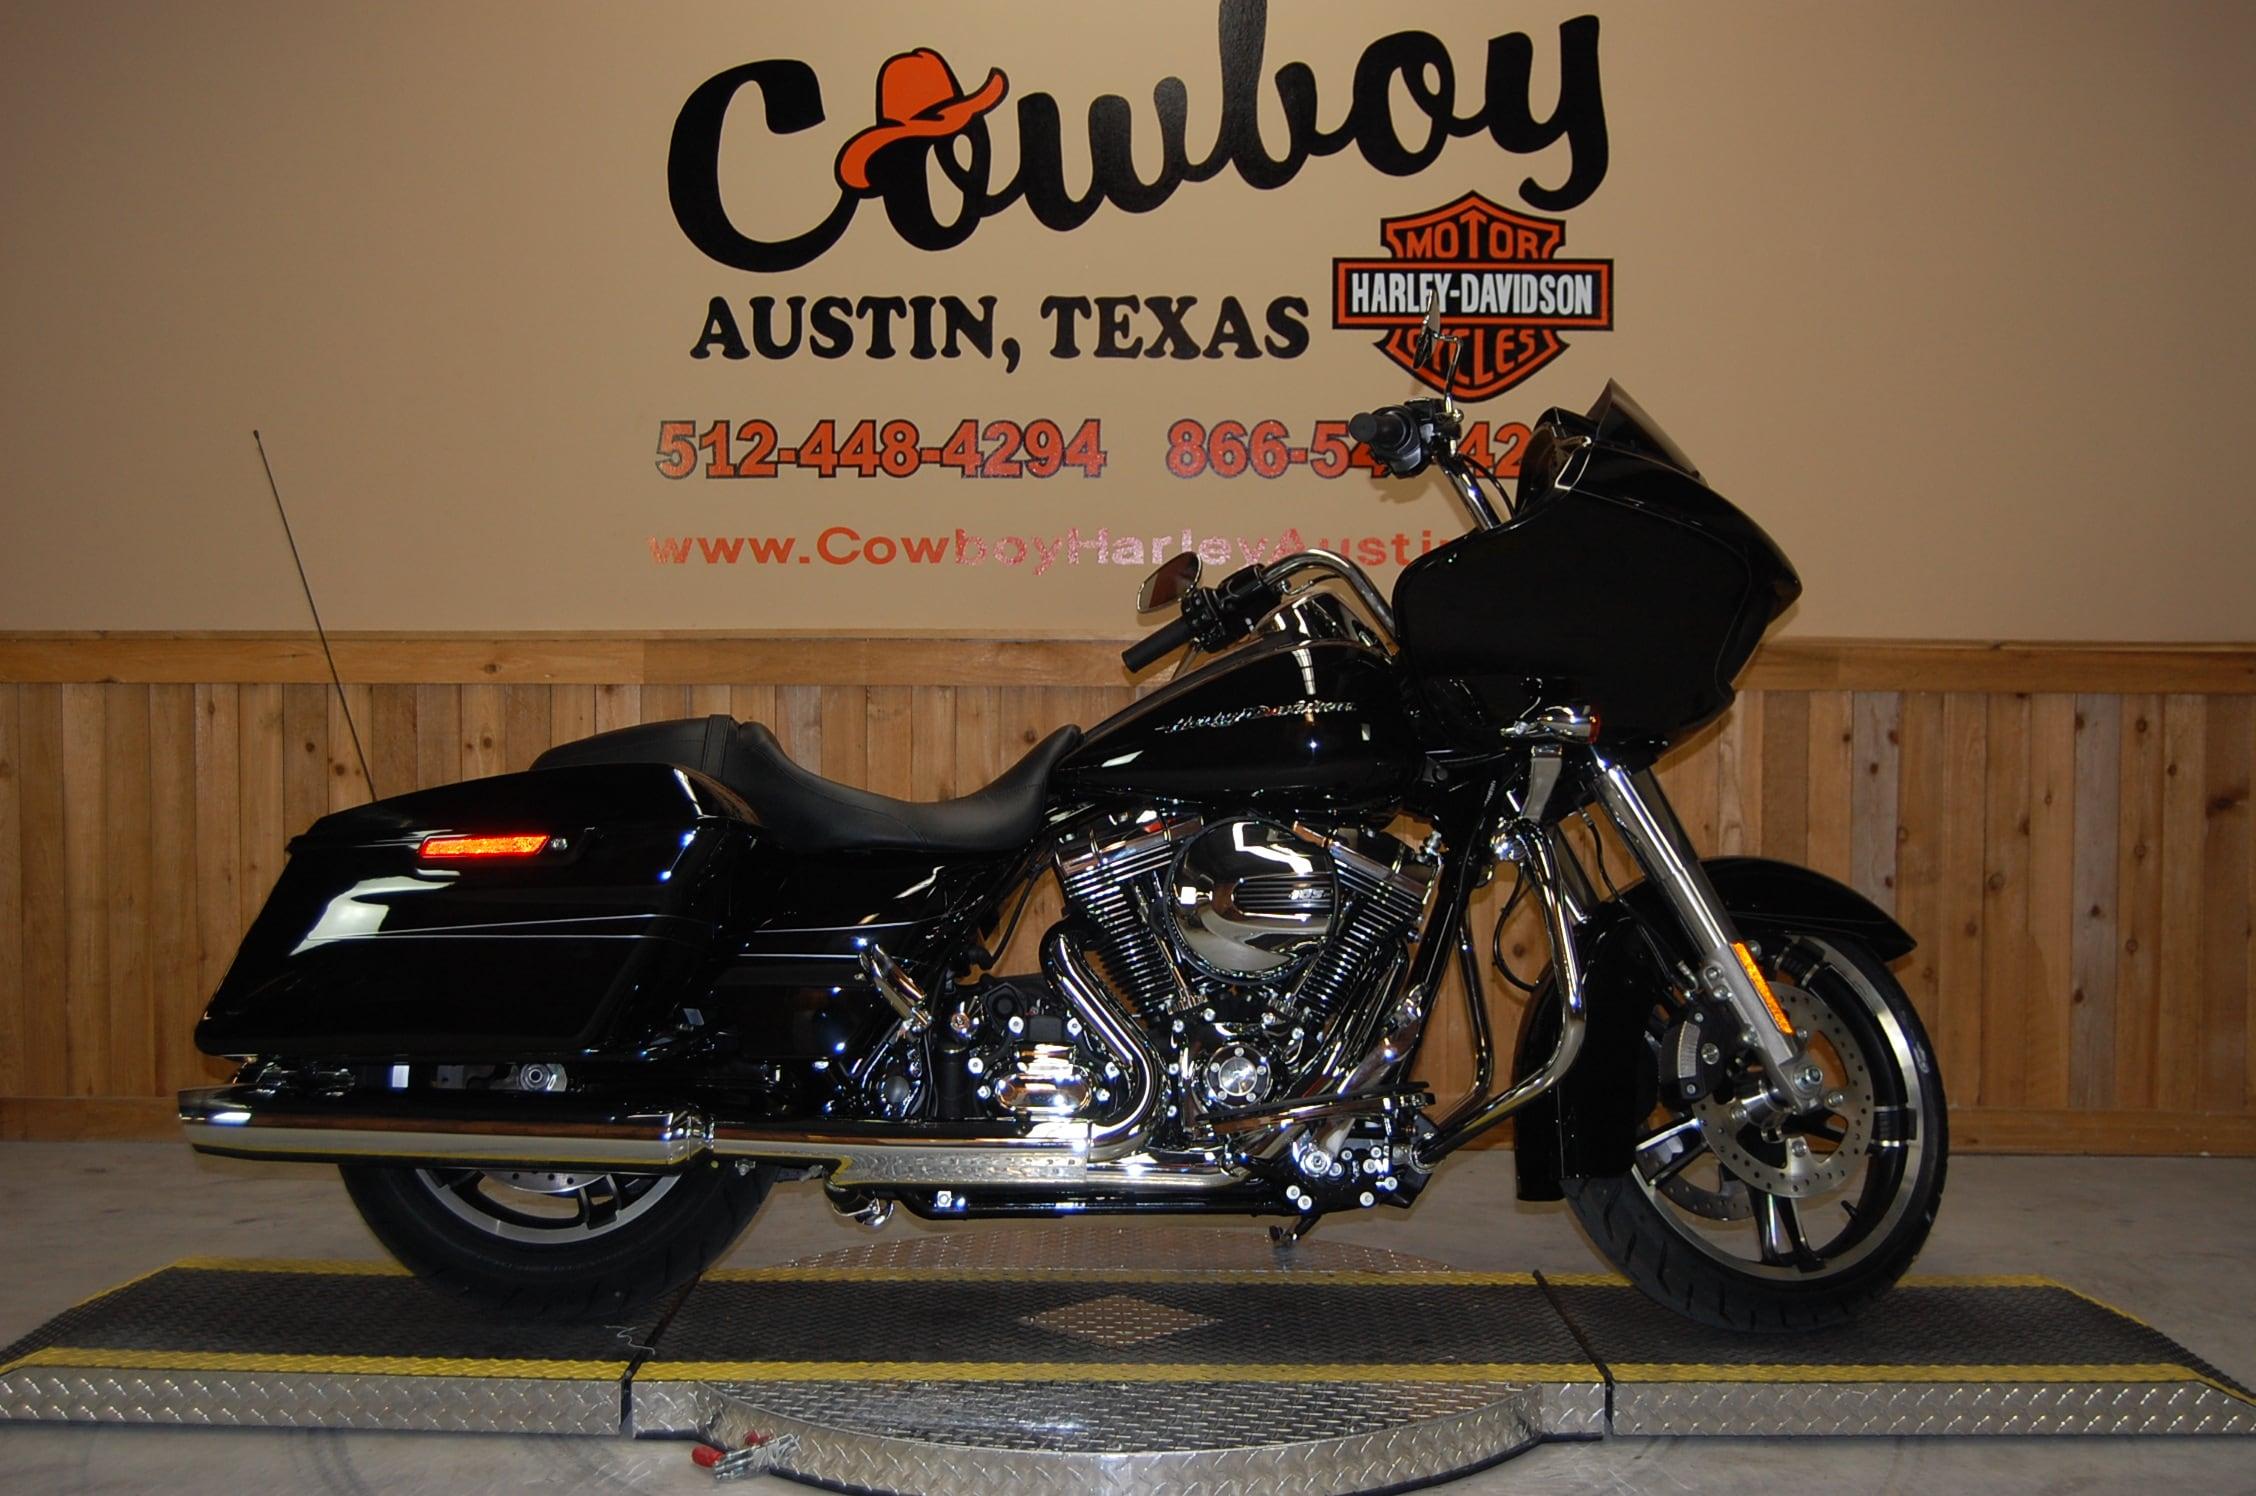 New > 2015 > Harley-Davidson FLTRXS Road Glide Special > 2015 Harley